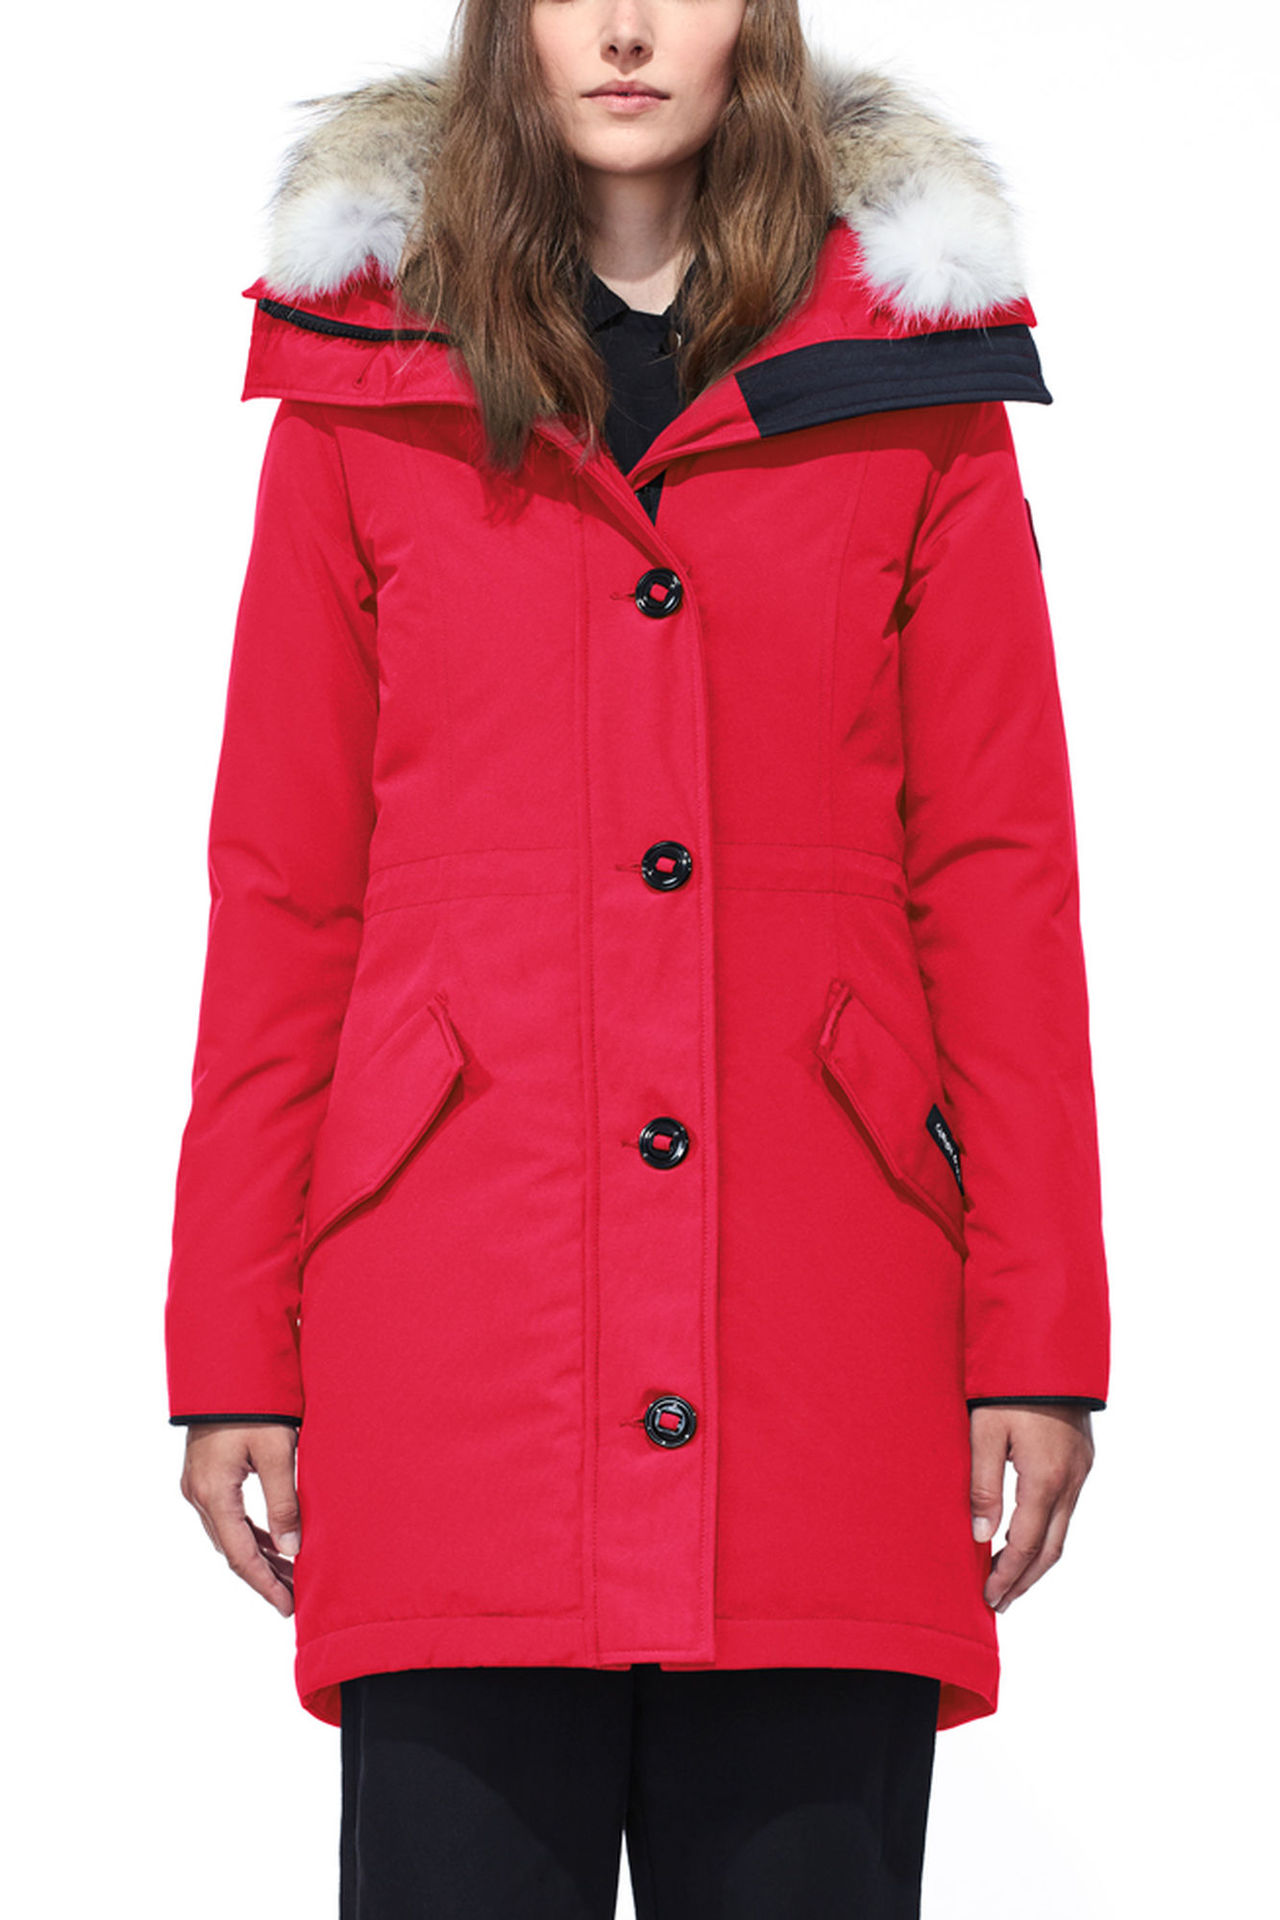 2017 New Goose Clothing Women Autumn Winter Parka Womens Long Jacket with Hat Detachable Warm Coat